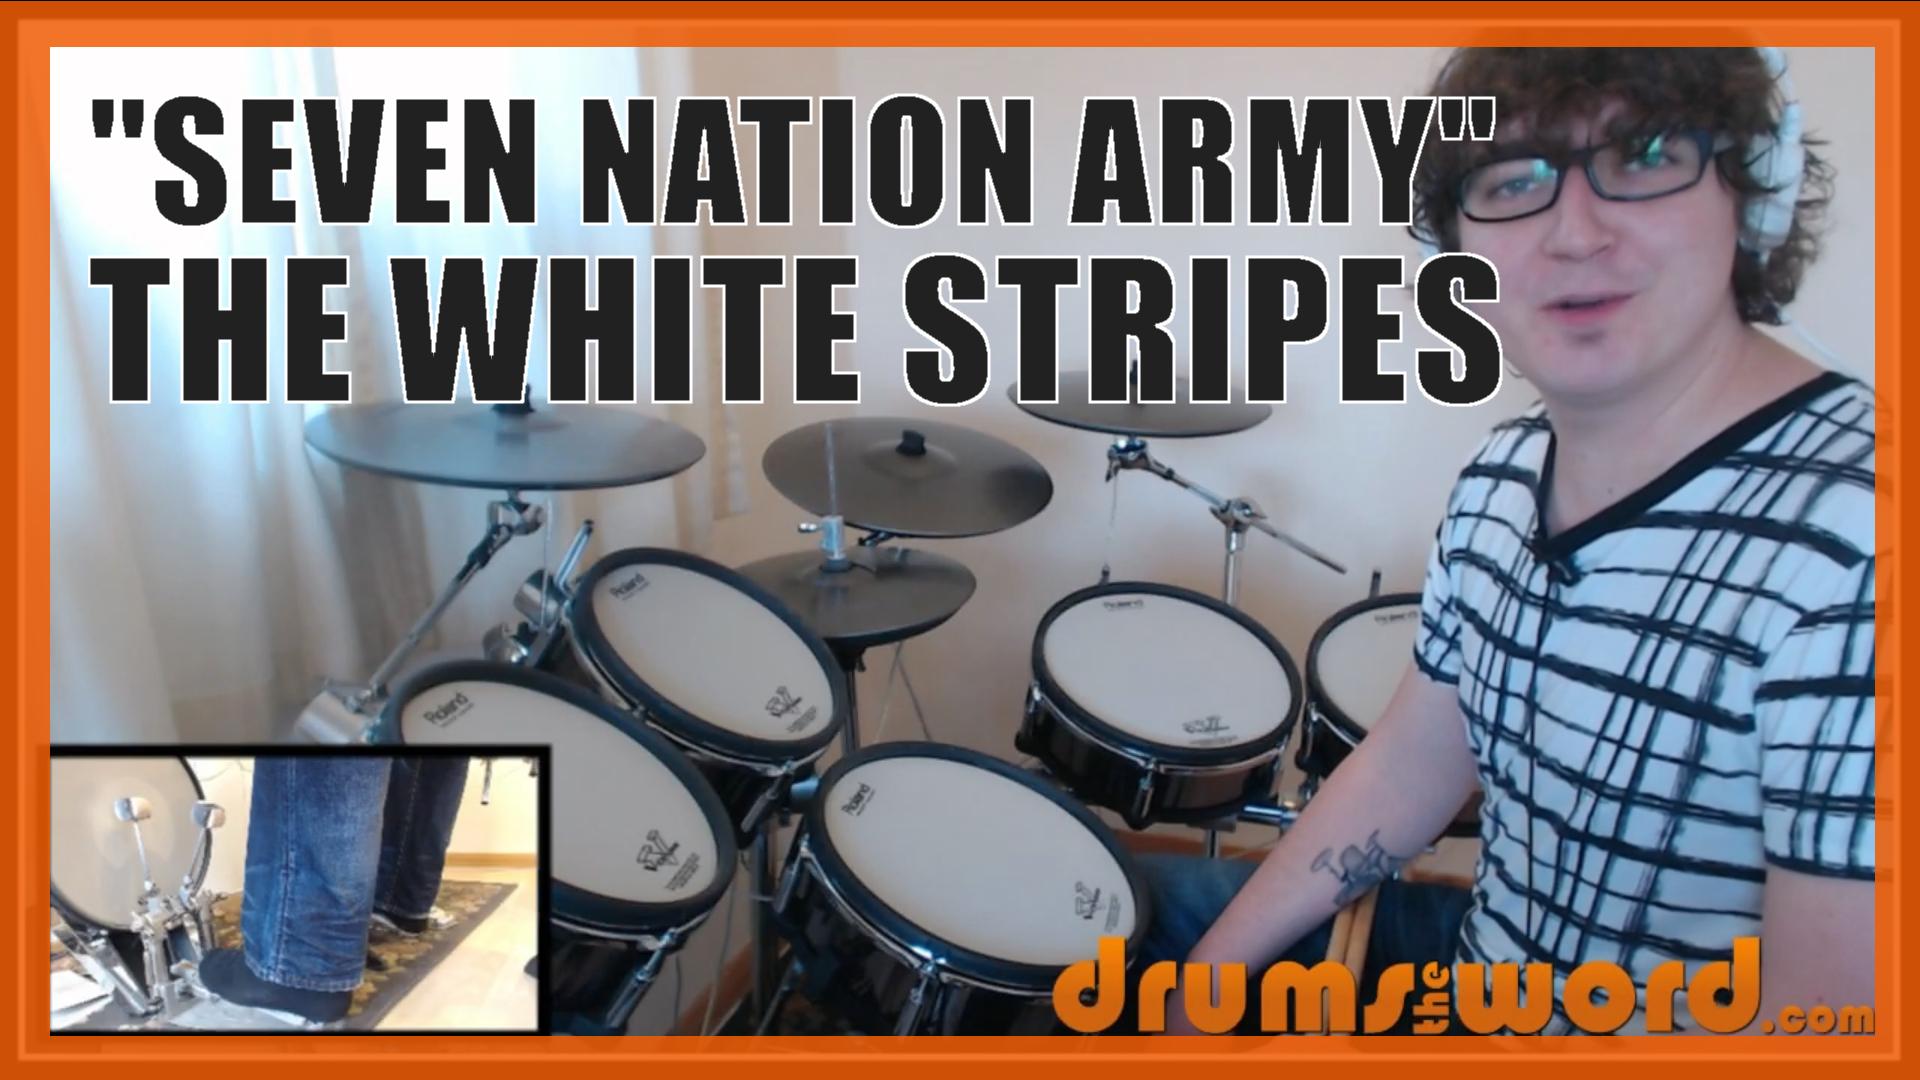 SEVEN NATION ARMY (The White Stripes: Meg White)